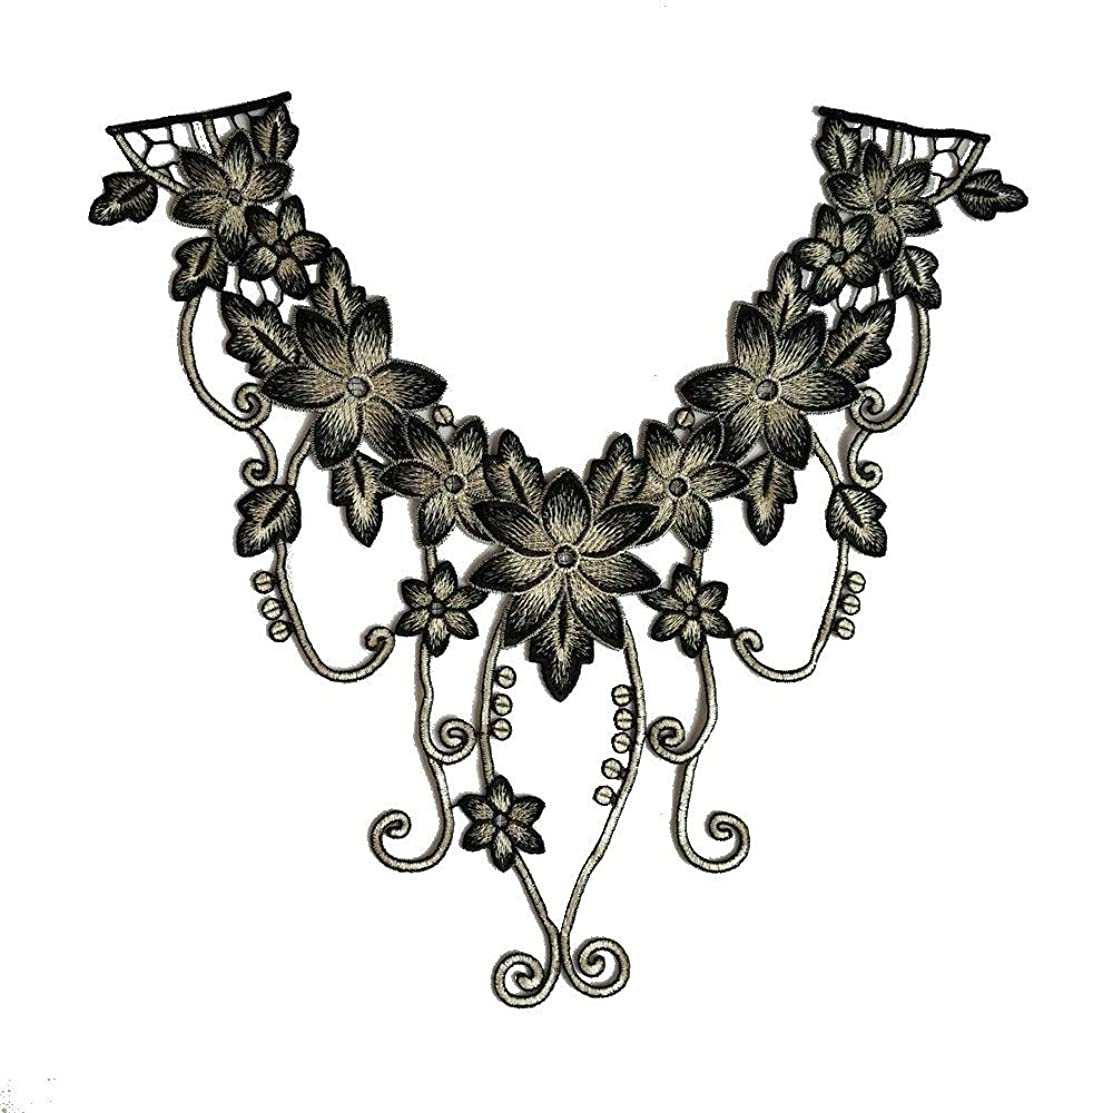 1 Pcs Black Floral Lace Collar Fabric Trim DIY Embroidery Lace Fabric Neckline Applique Sewing Craft (Color 7)